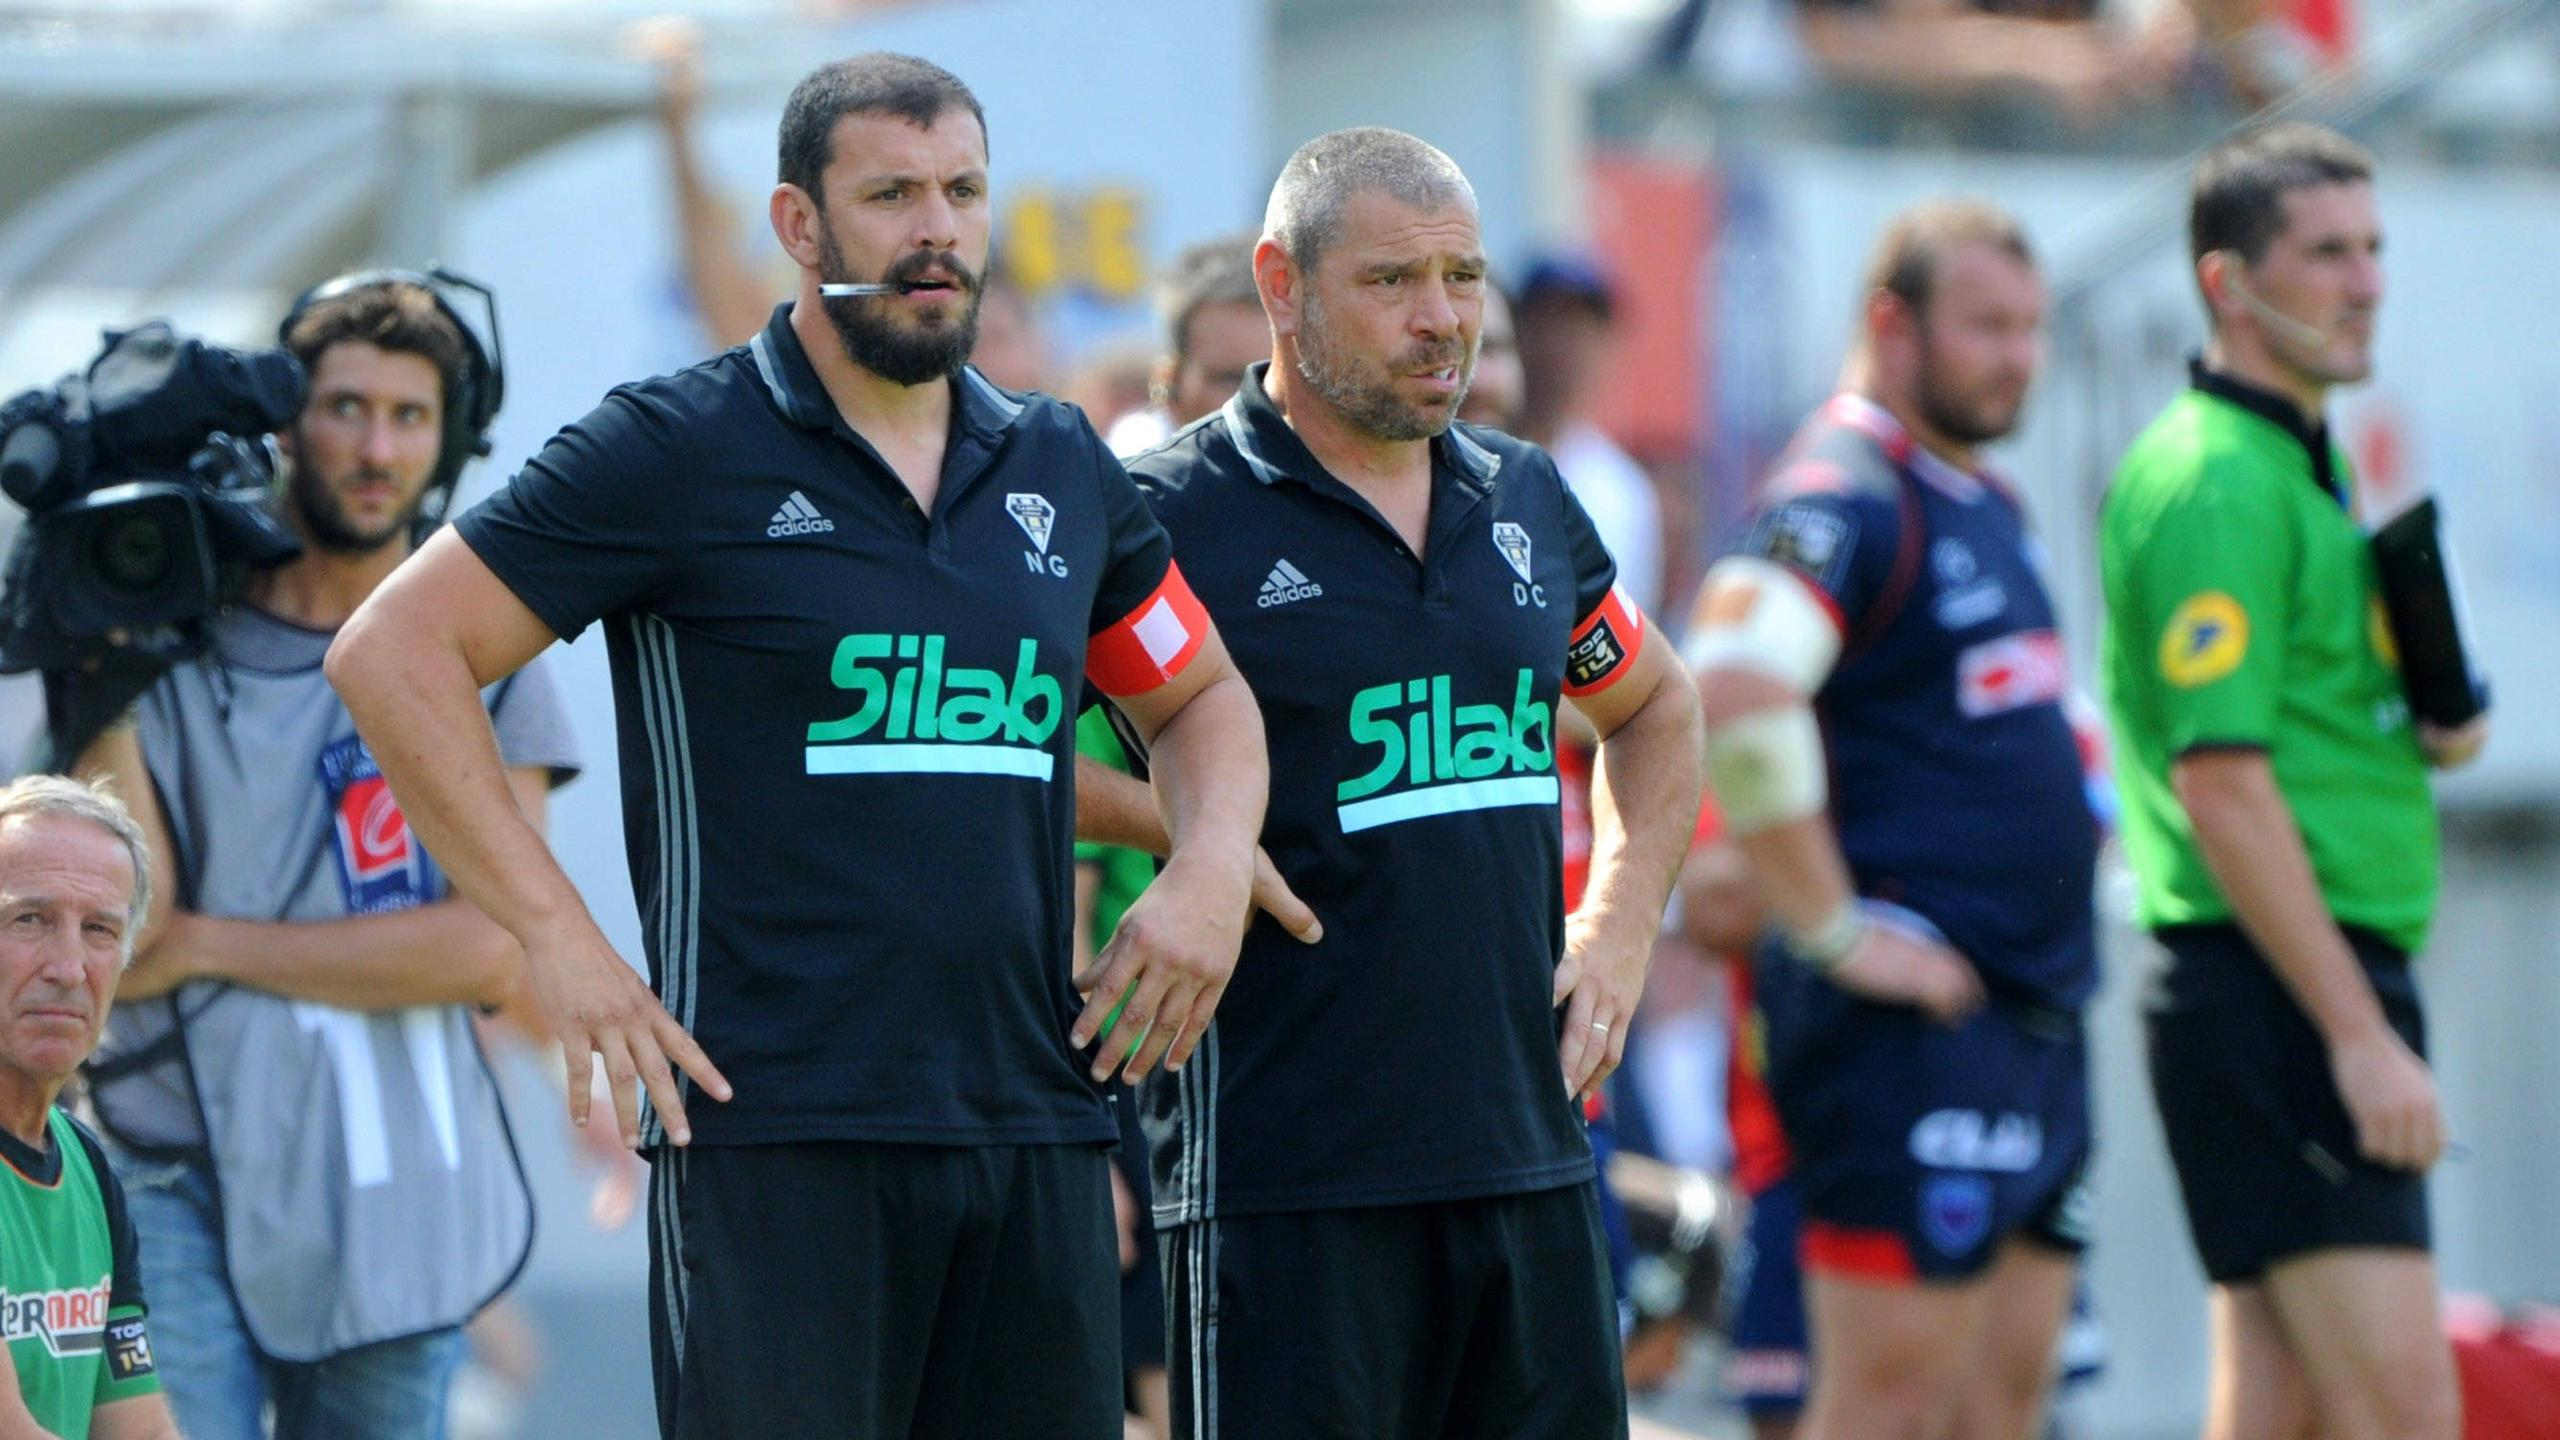 Nicolas Godignon et Didier Casadei (Brive) - 11 septembre 2016